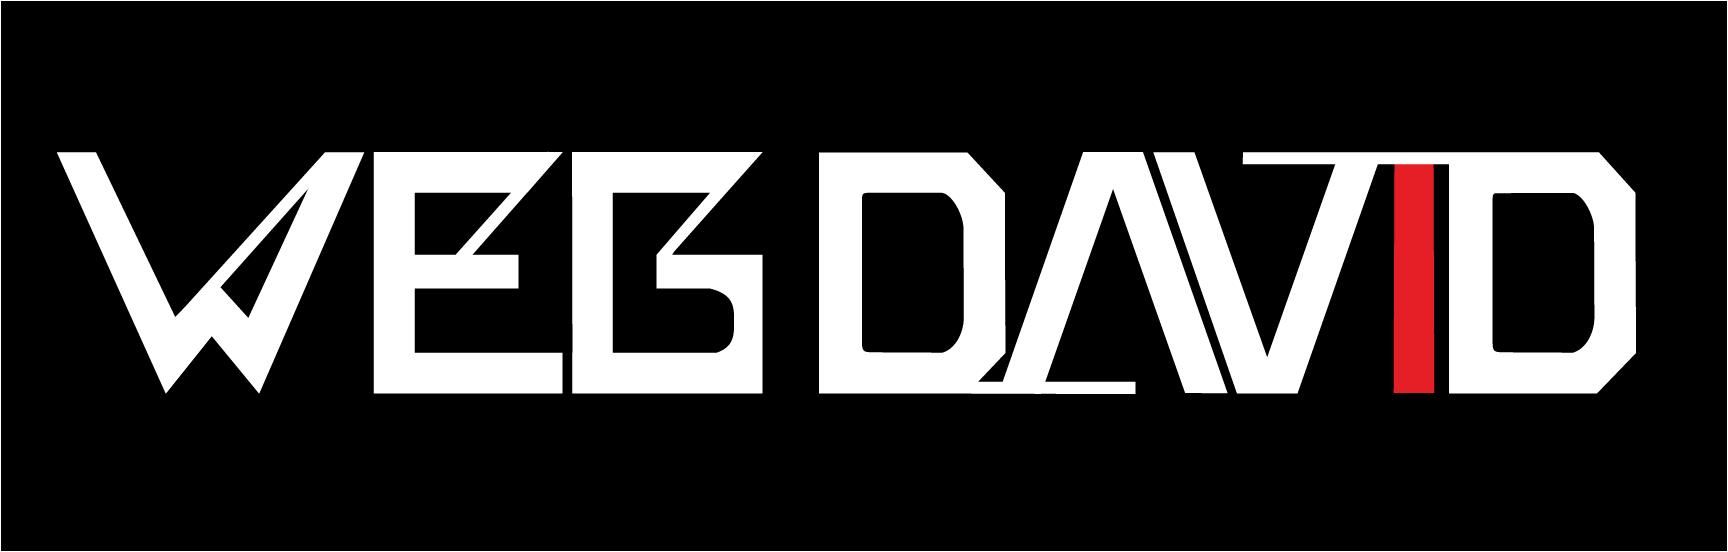 WebDavid - web developer